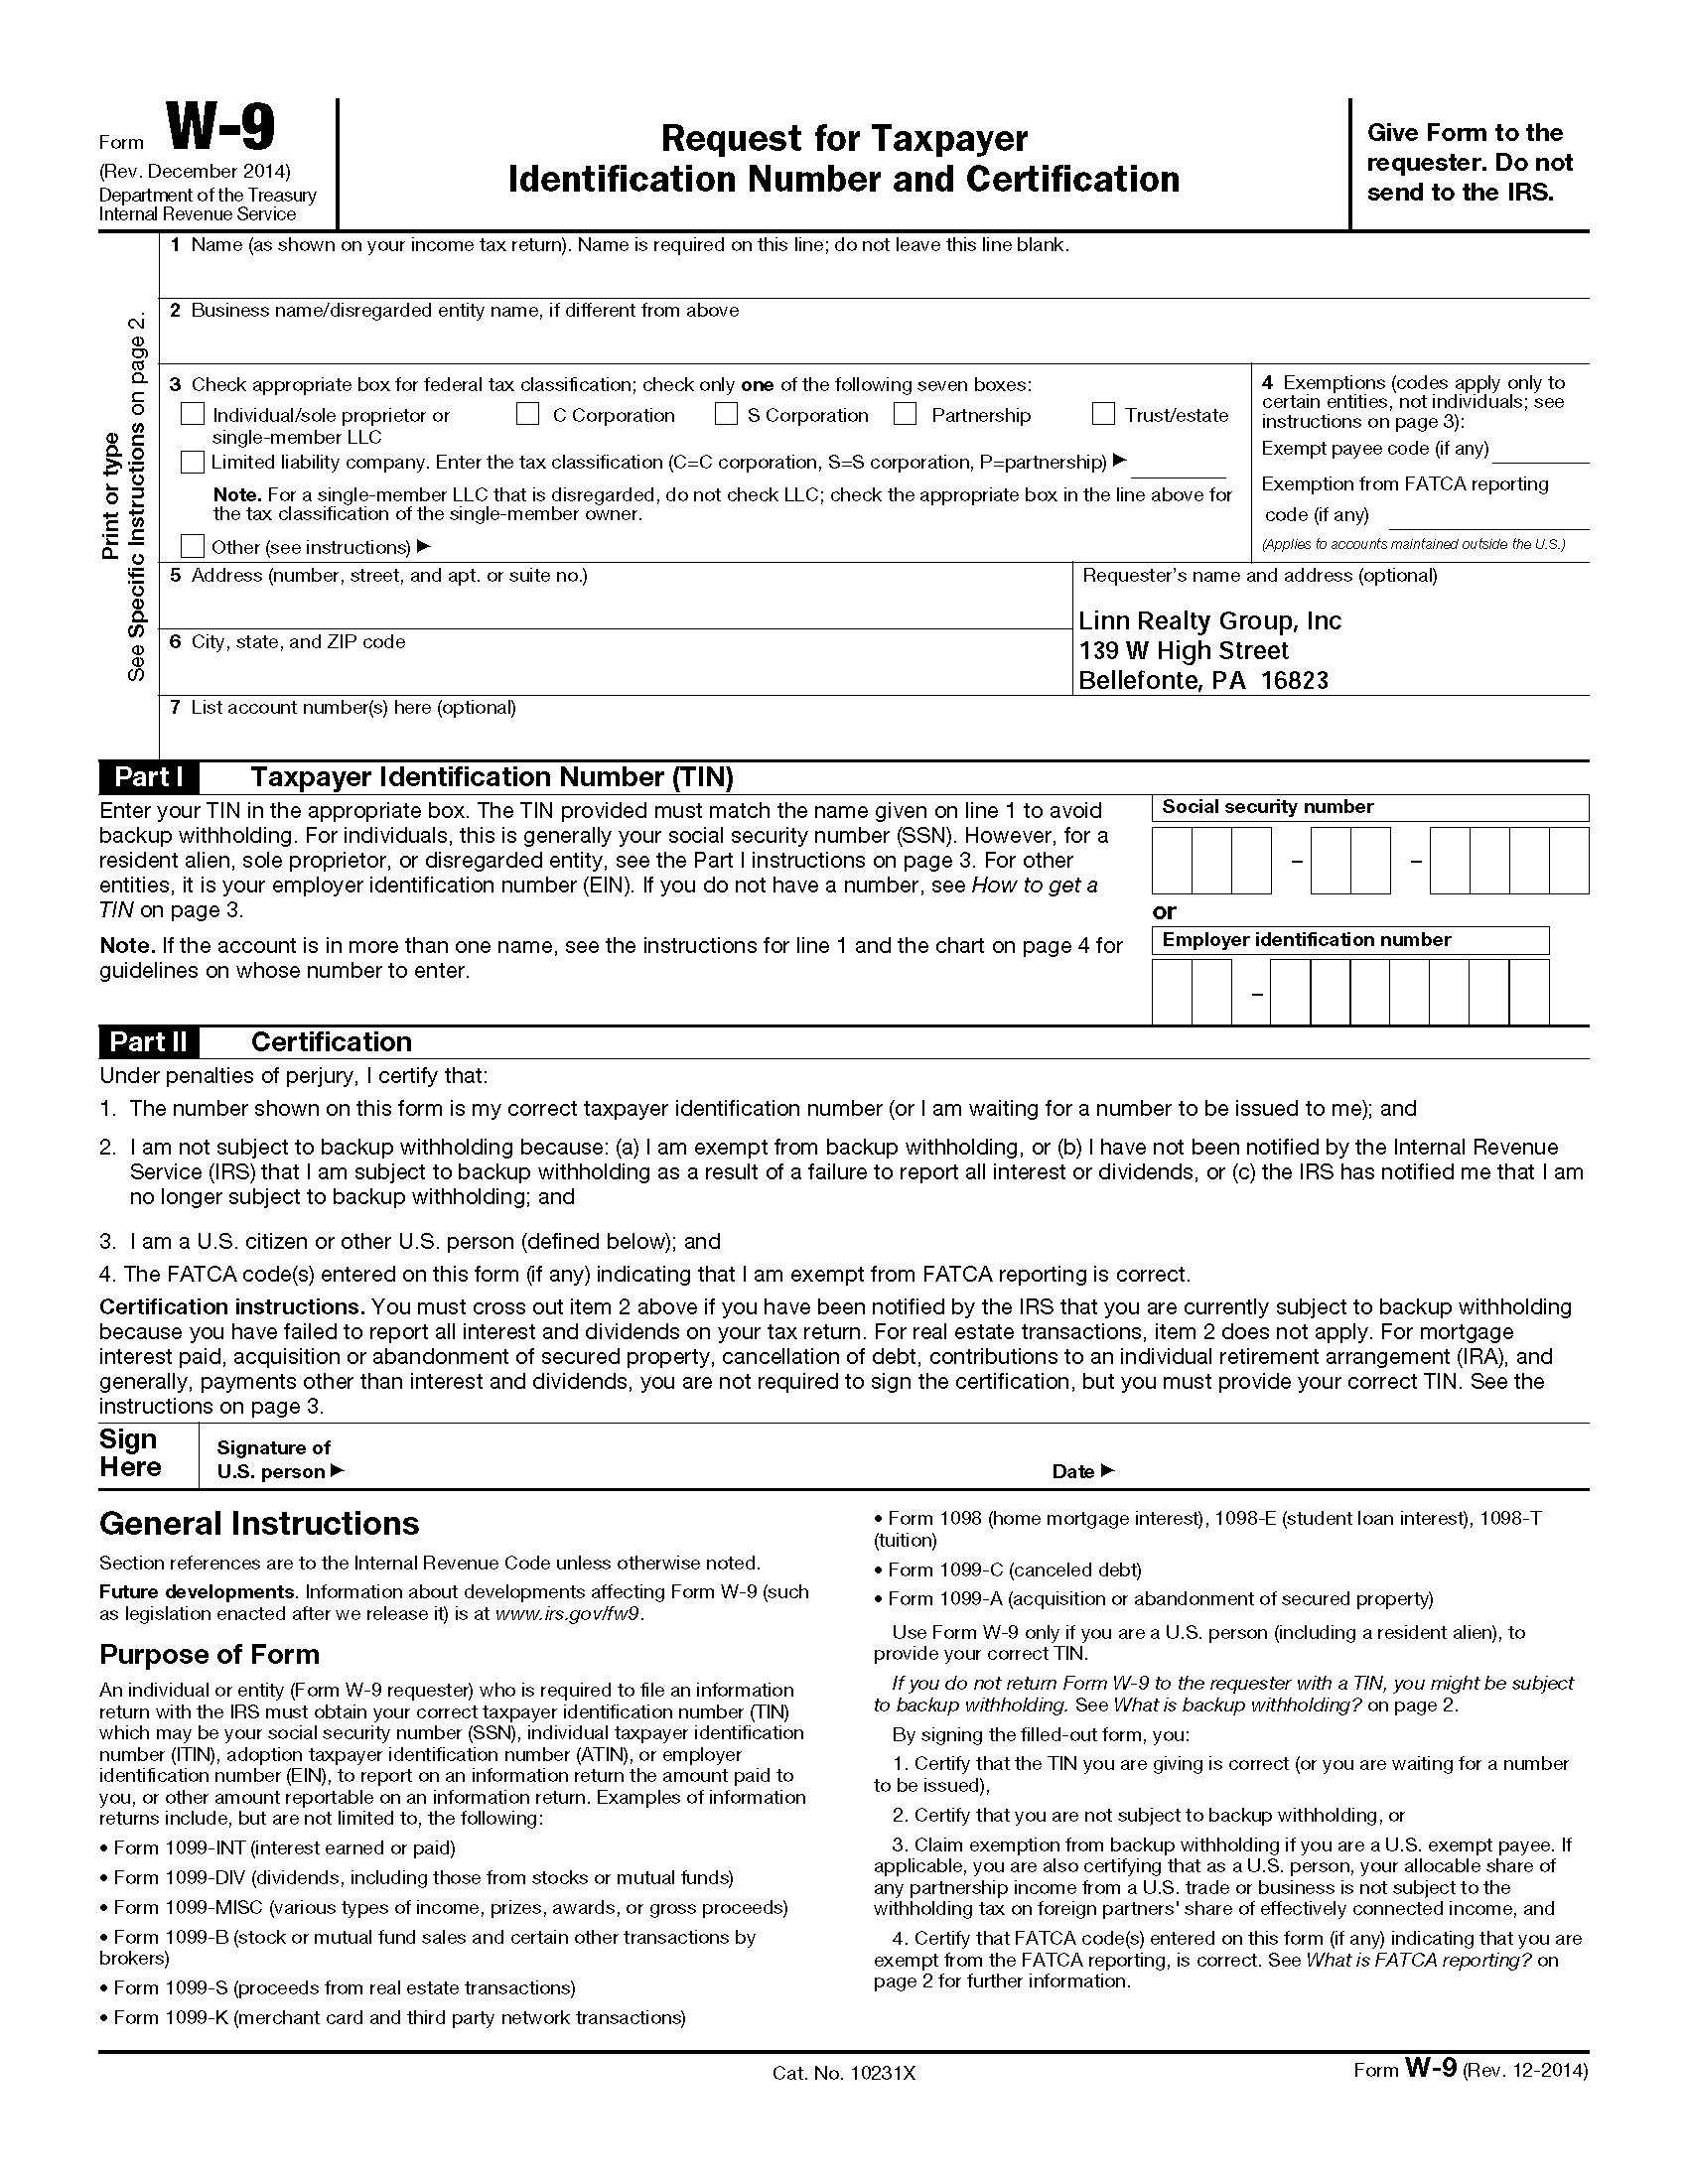 Blank 2019 W 9 Form Printable | Calendar Template Printable-Printable W-9 Forms Blank 2020